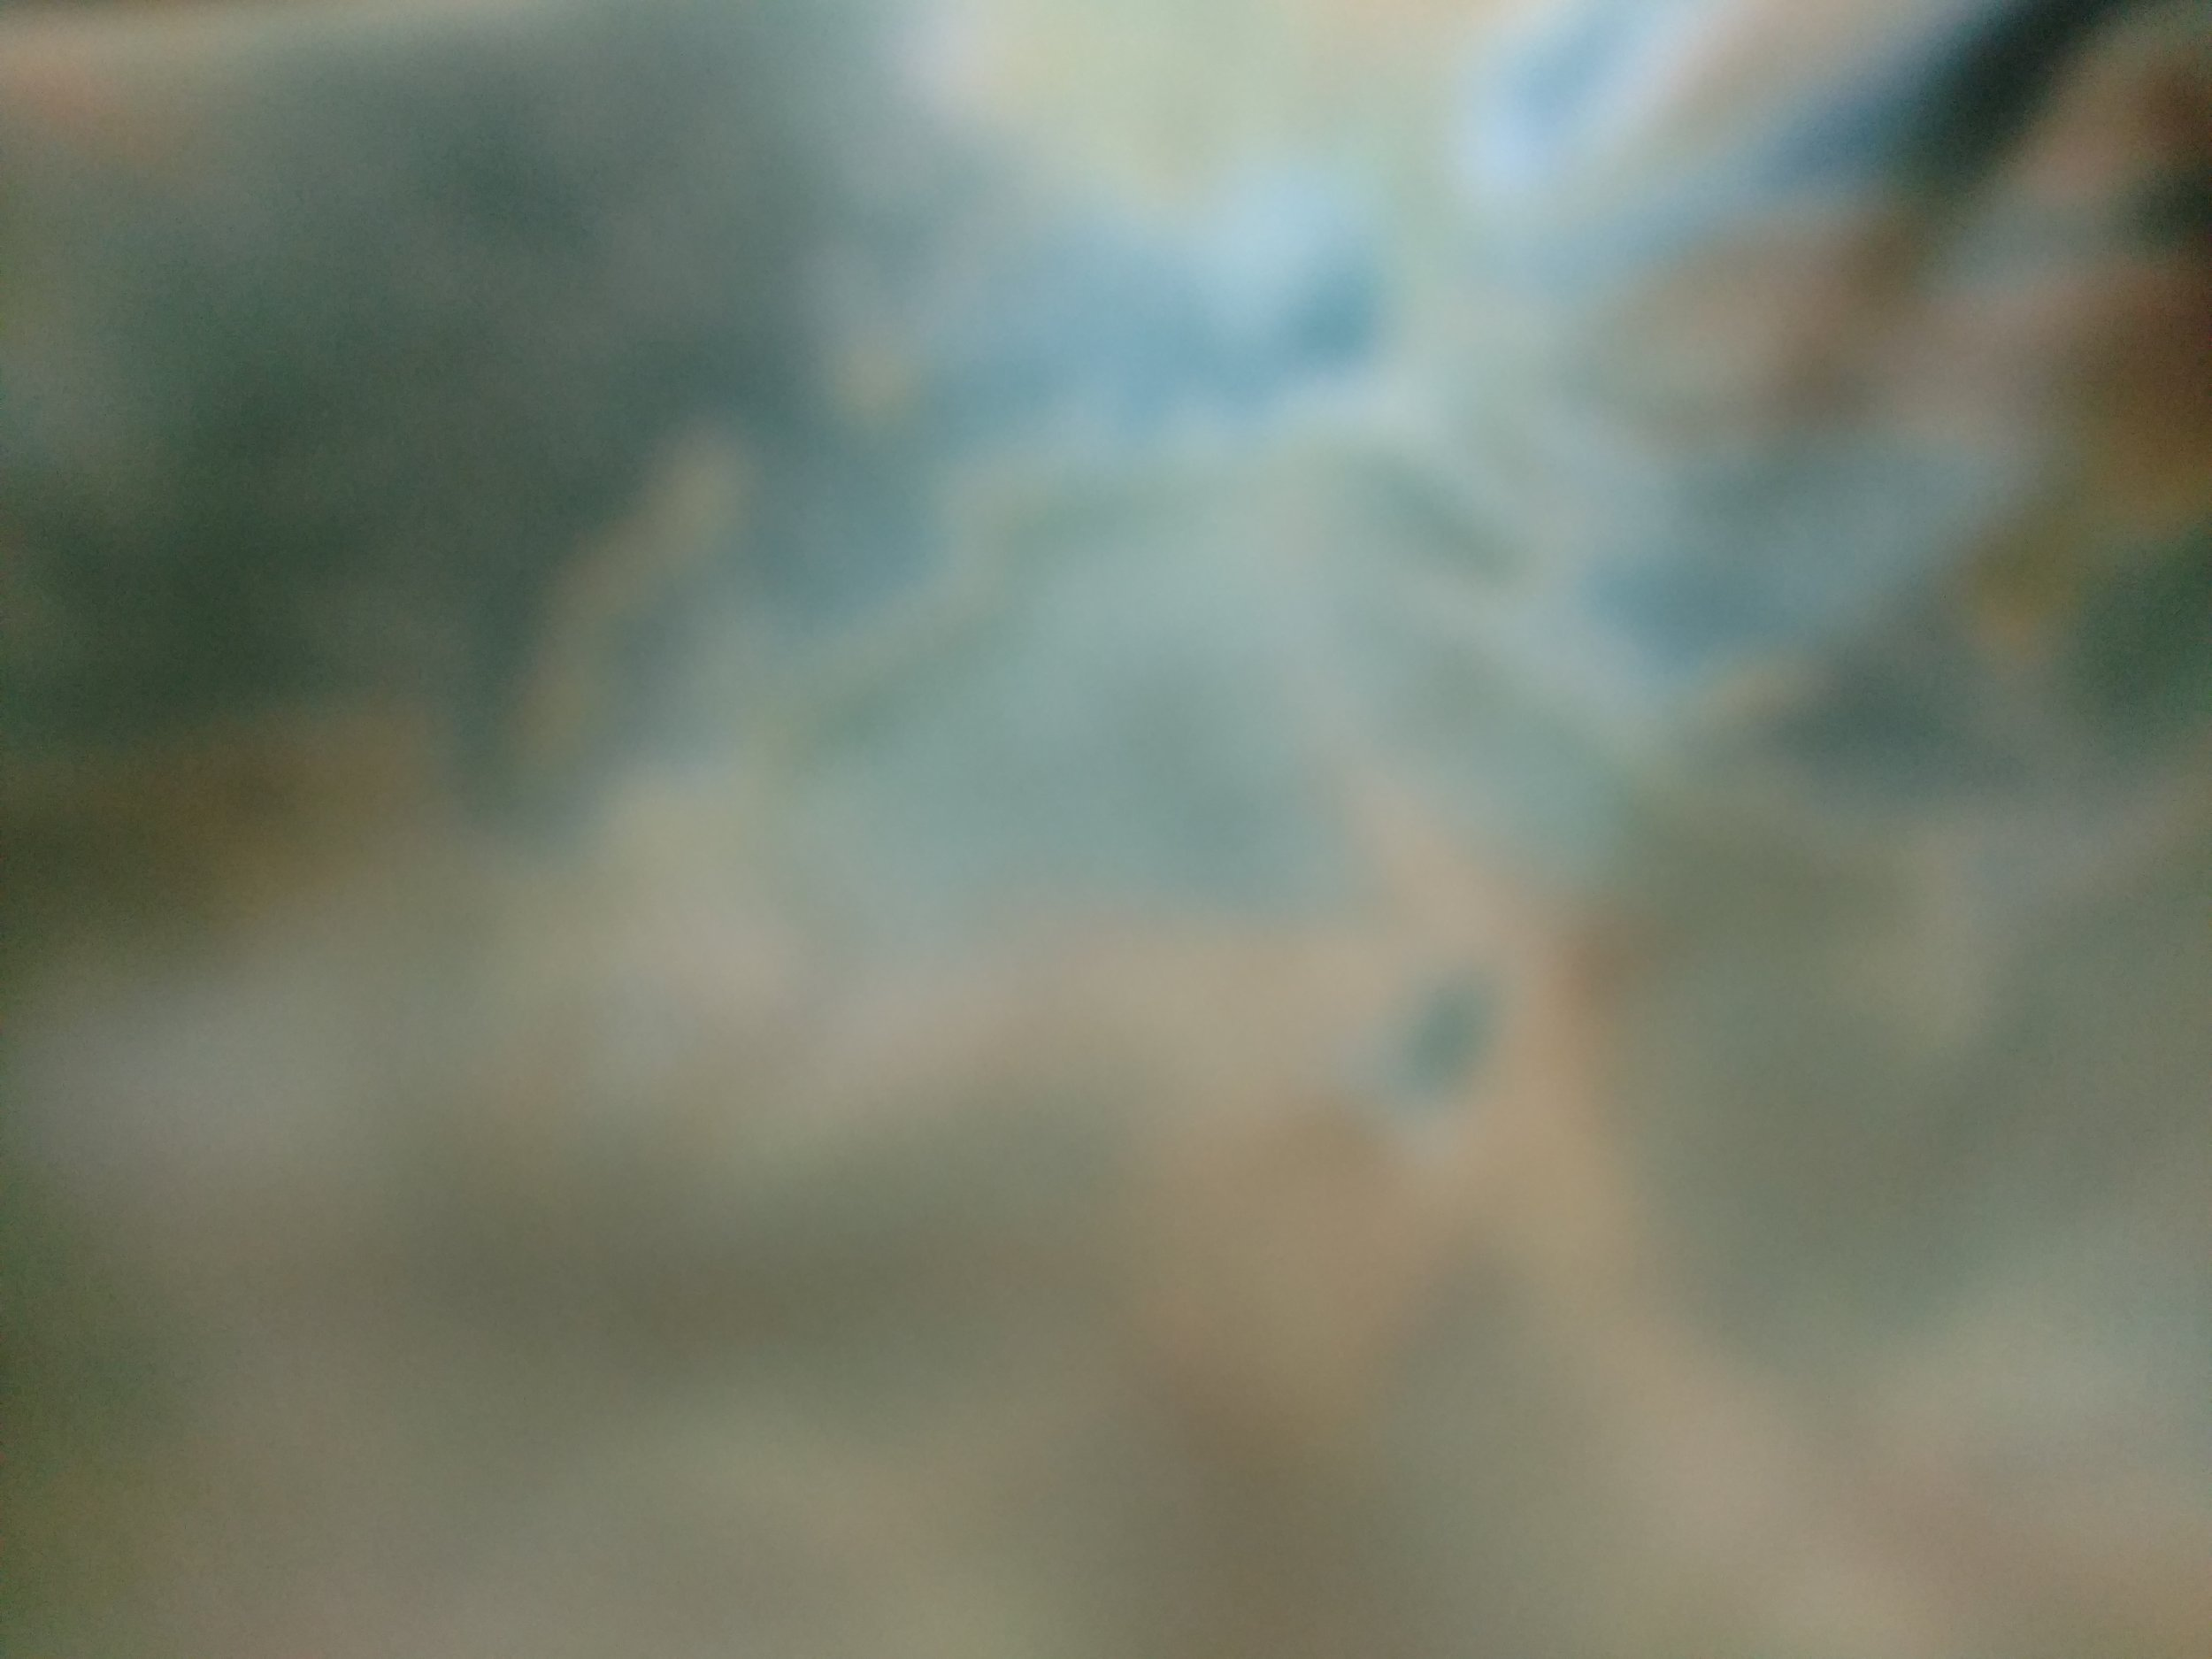 willroth-co-free-texture-gradient-043.jpg